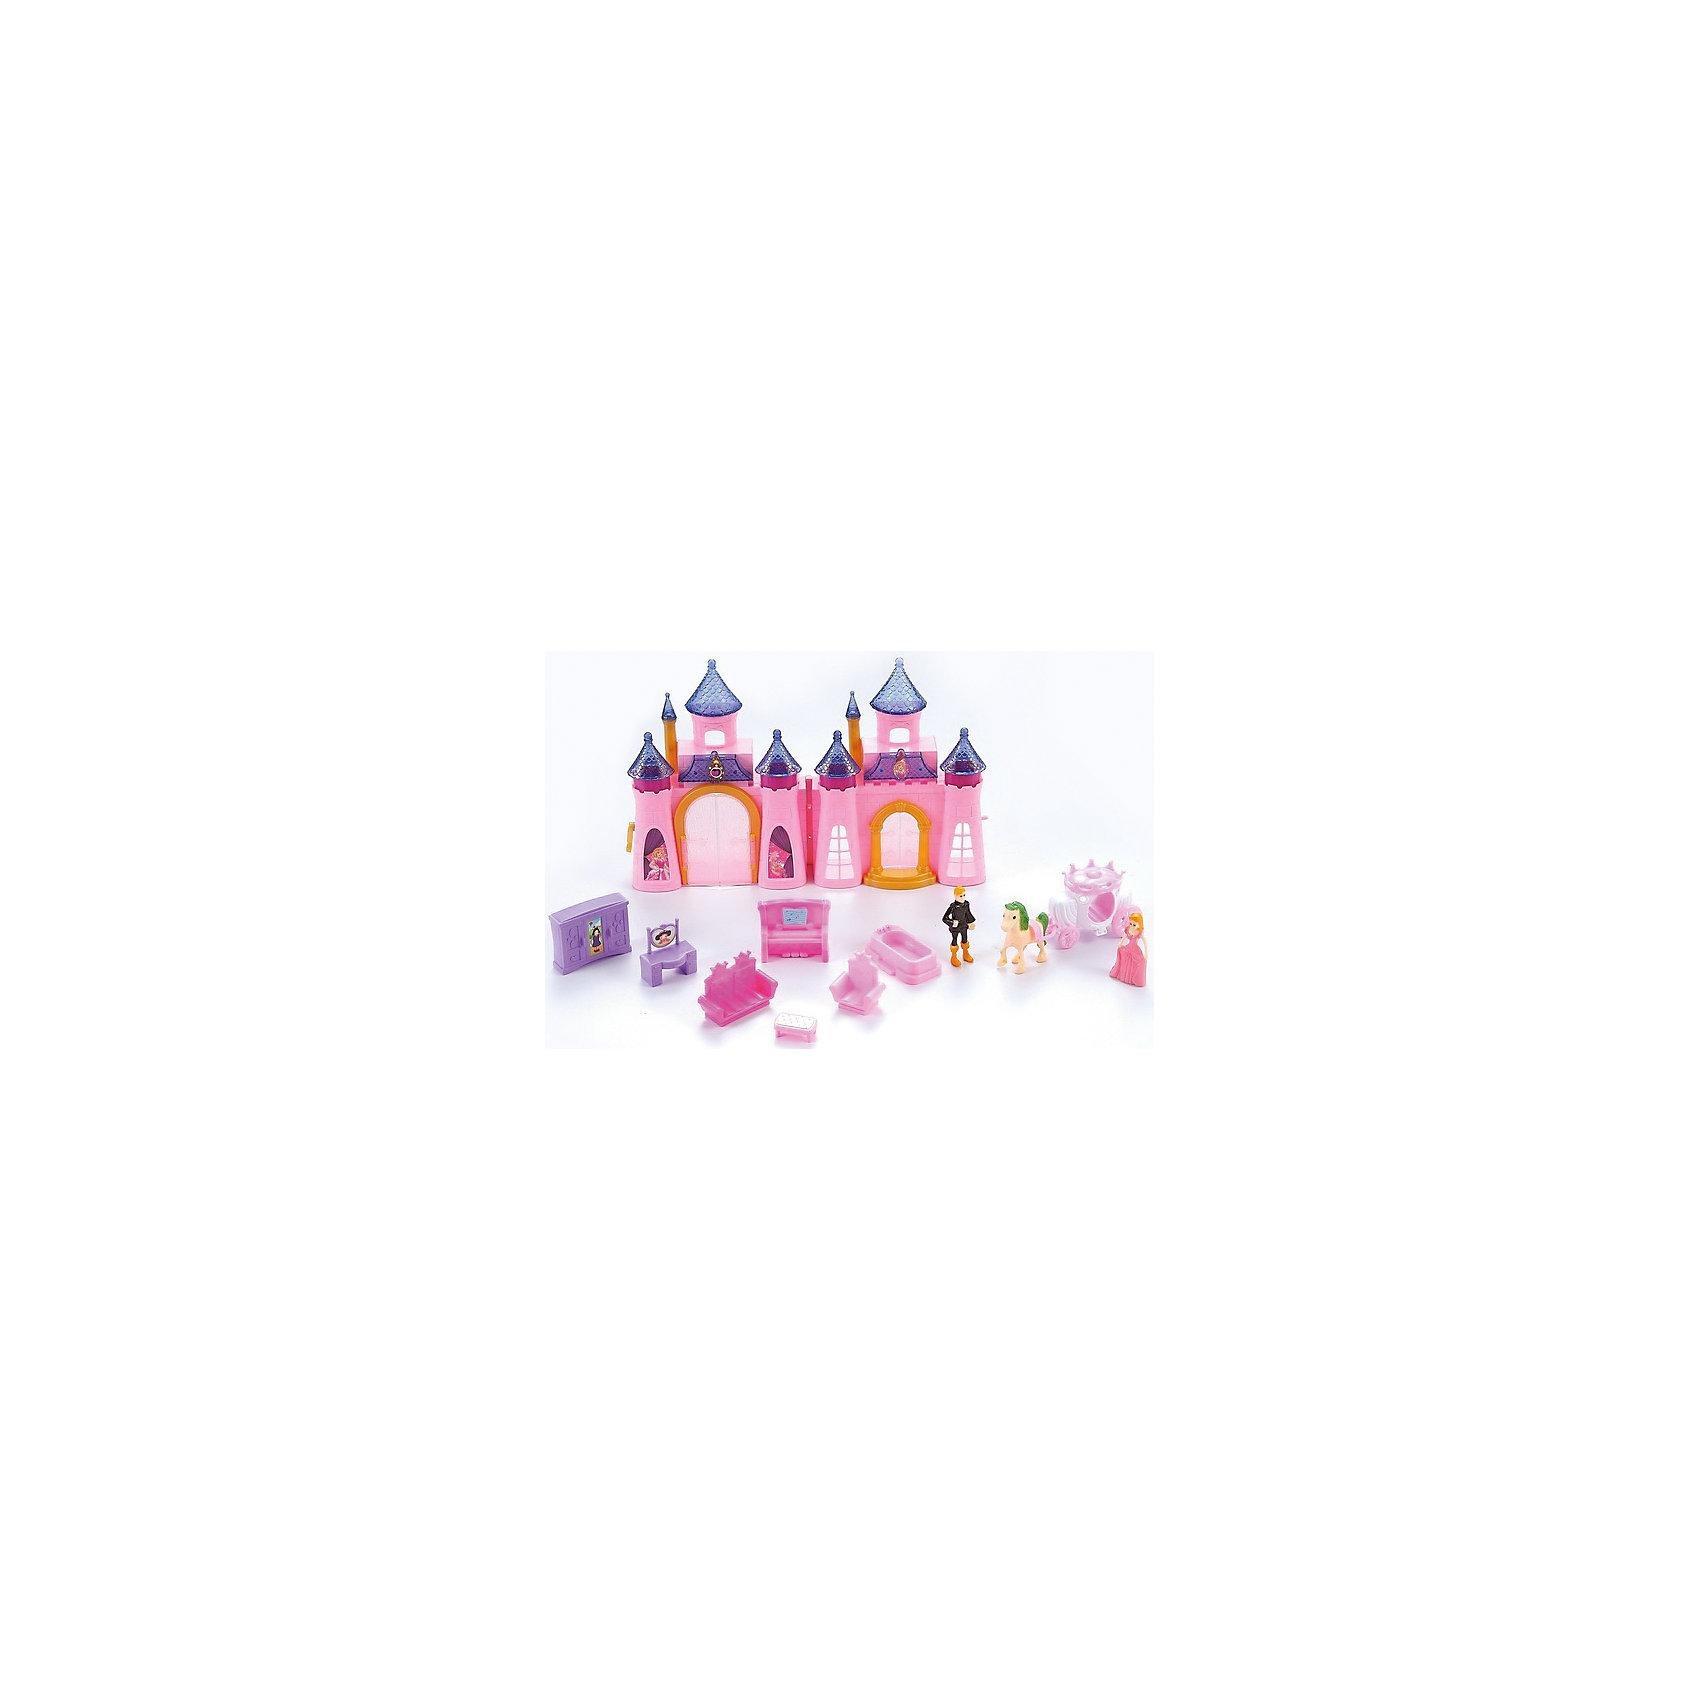 Замок для куклы  Dolly Toy Королевский дворец, DollyToyИдеи подарков<br><br><br>Ширина мм: 520<br>Глубина мм: 360<br>Высота мм: 65<br>Вес г: 1000<br>Возраст от месяцев: 36<br>Возраст до месяцев: 72<br>Пол: Женский<br>Возраст: Детский<br>SKU: 5581268